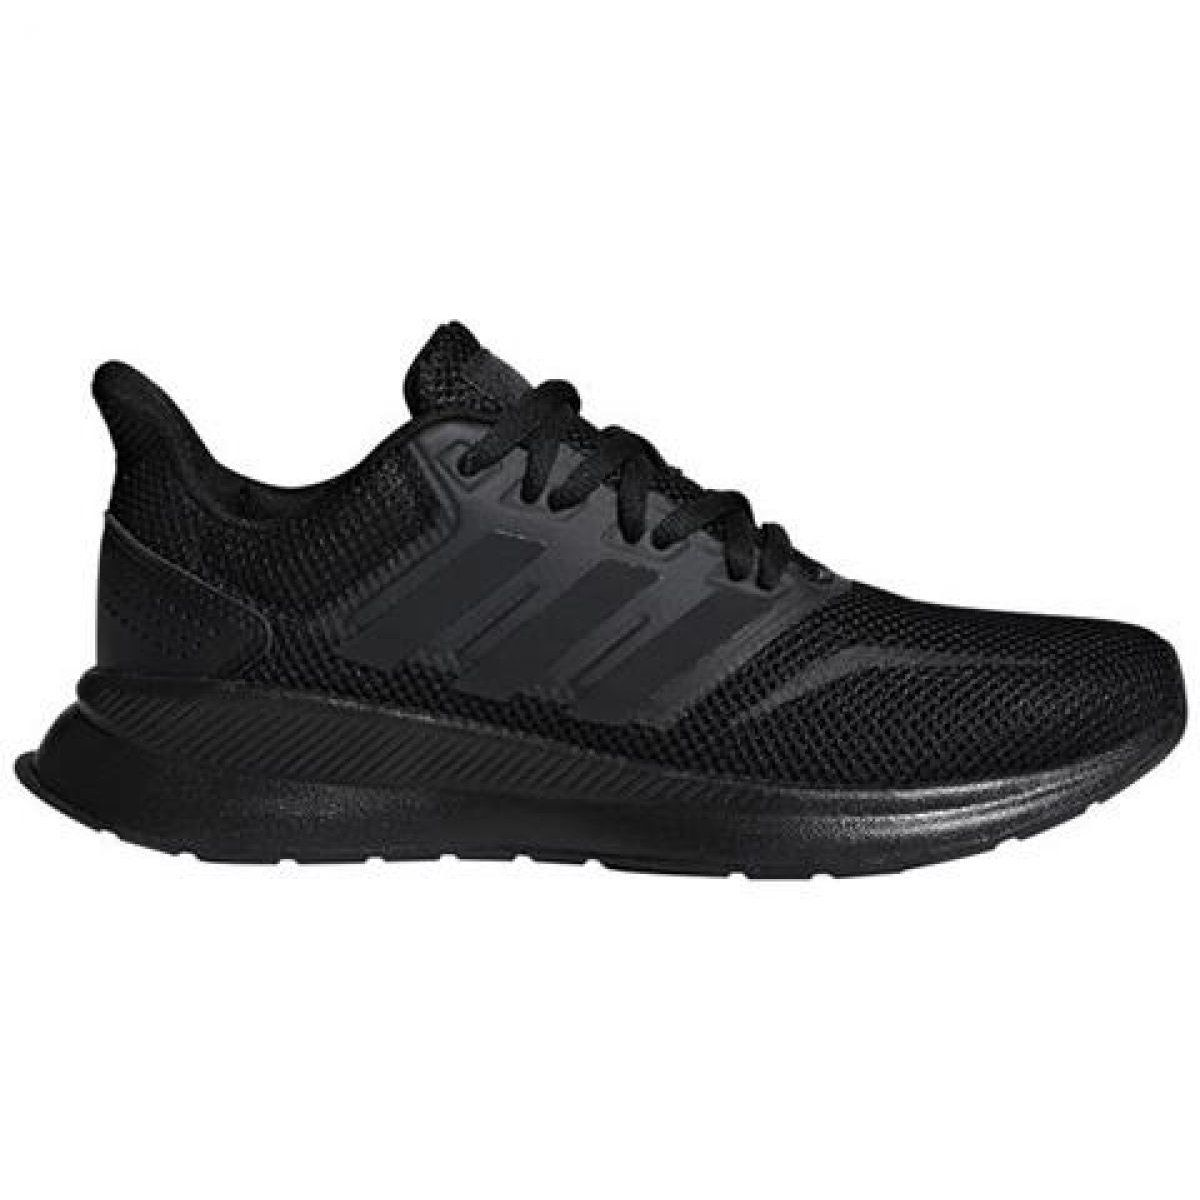 Buty Adidas Runfalcon Jr F36549 Czarne Kids Sports Shoes Girls Shoes Stylish Running Shoes